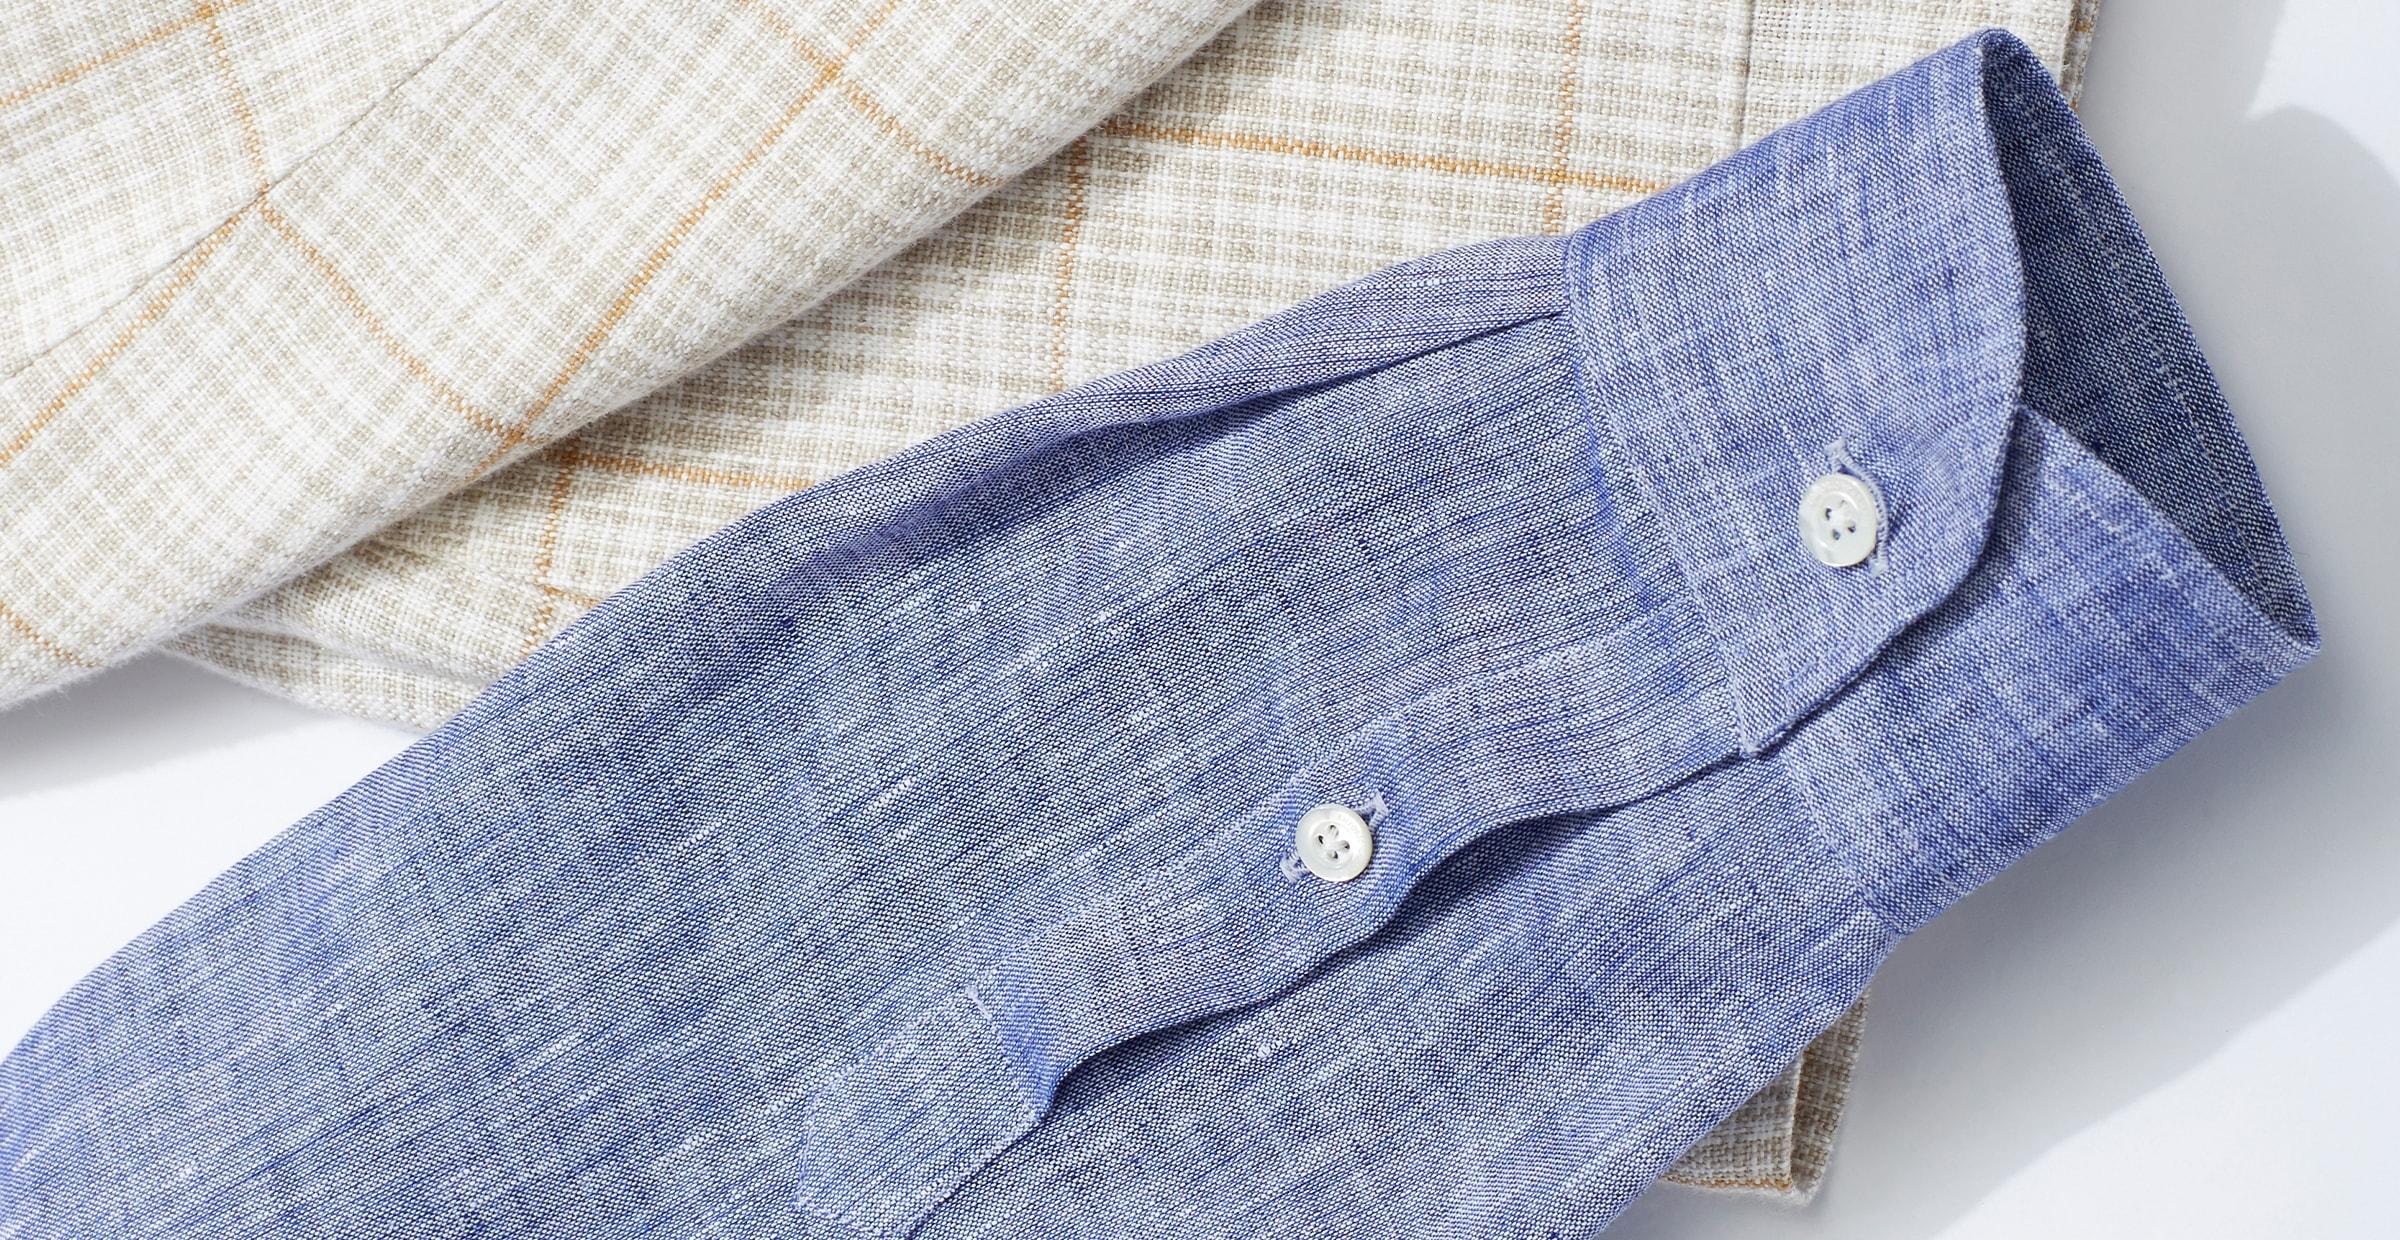 Breathable shirt fabrics for men